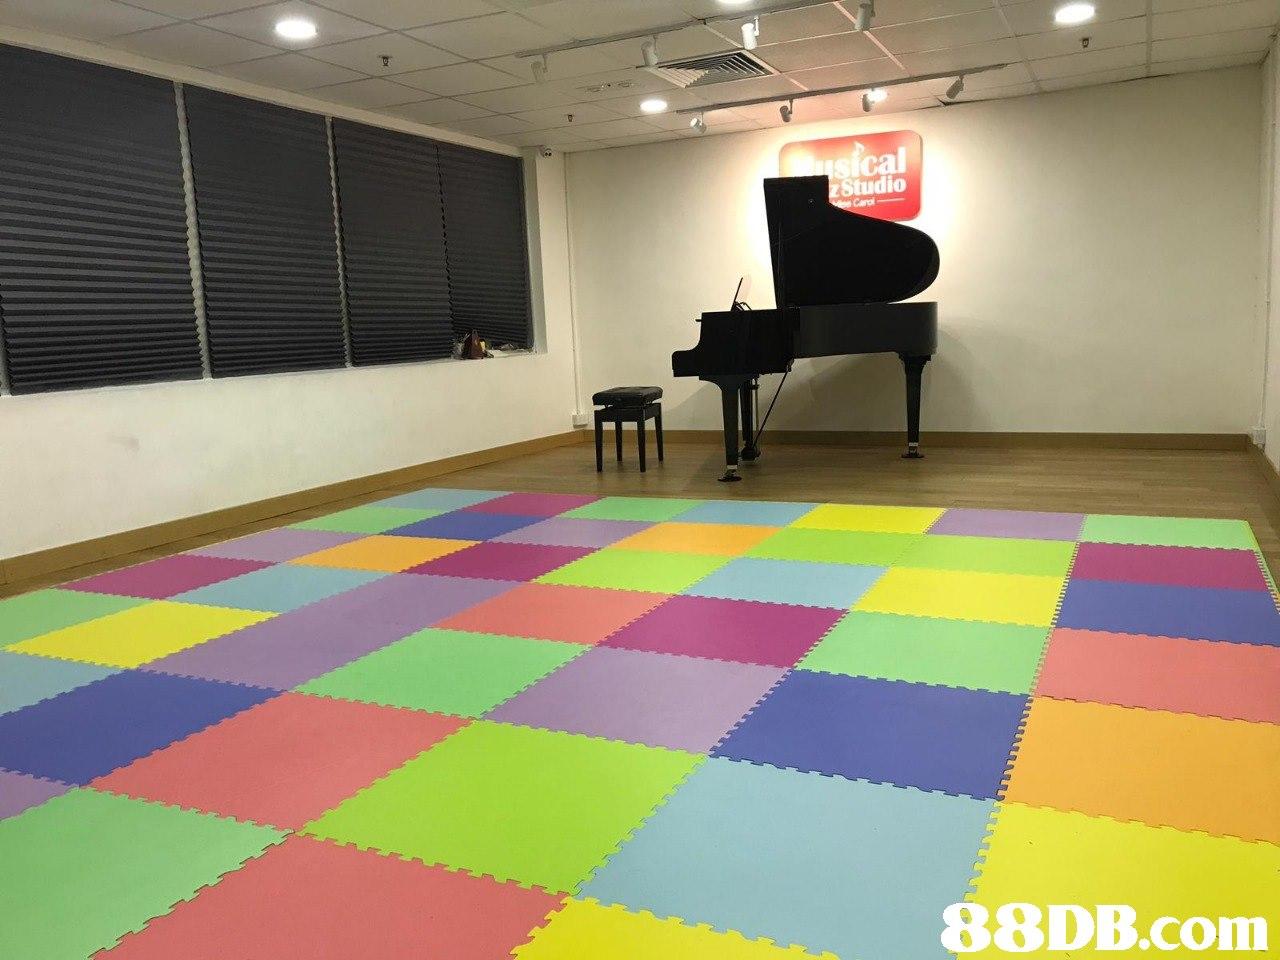 ical Studio   Floor,Flooring,Tile,Room,Interior design